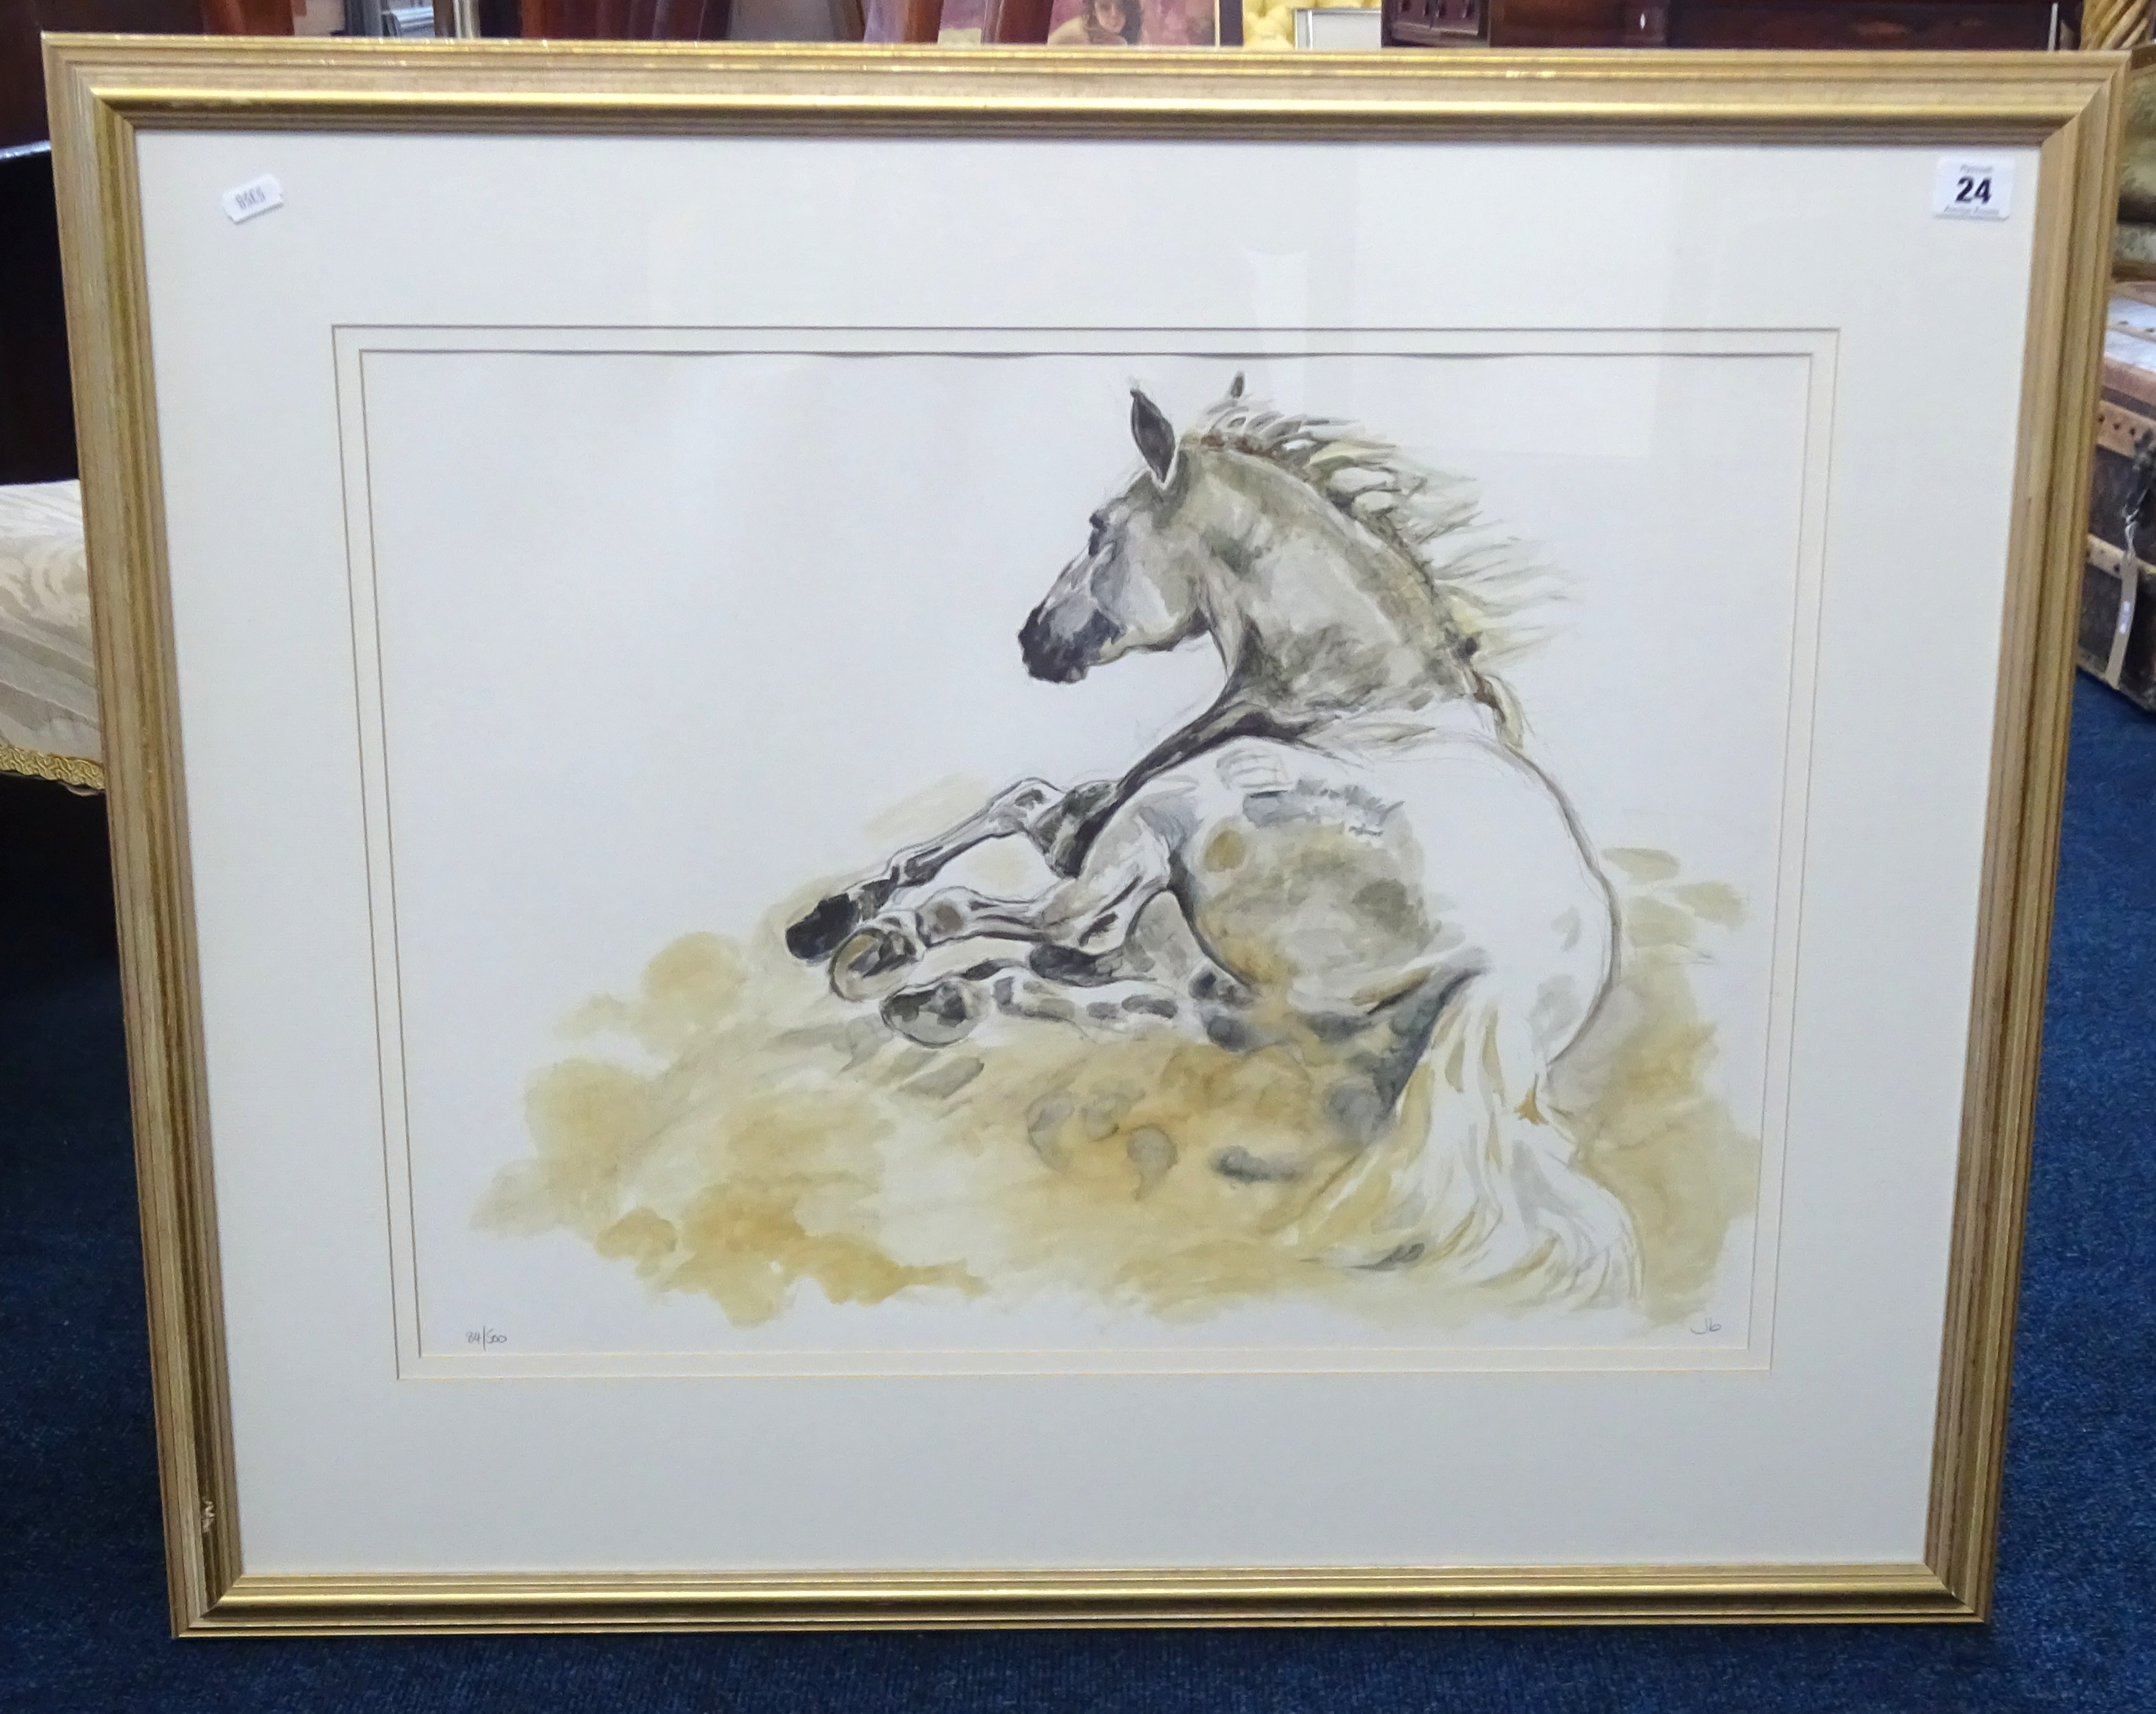 Lot 024 - Jennifer Brereton, limited edition print, horse study, number 84/ 500, framed and glazed, 43cm x